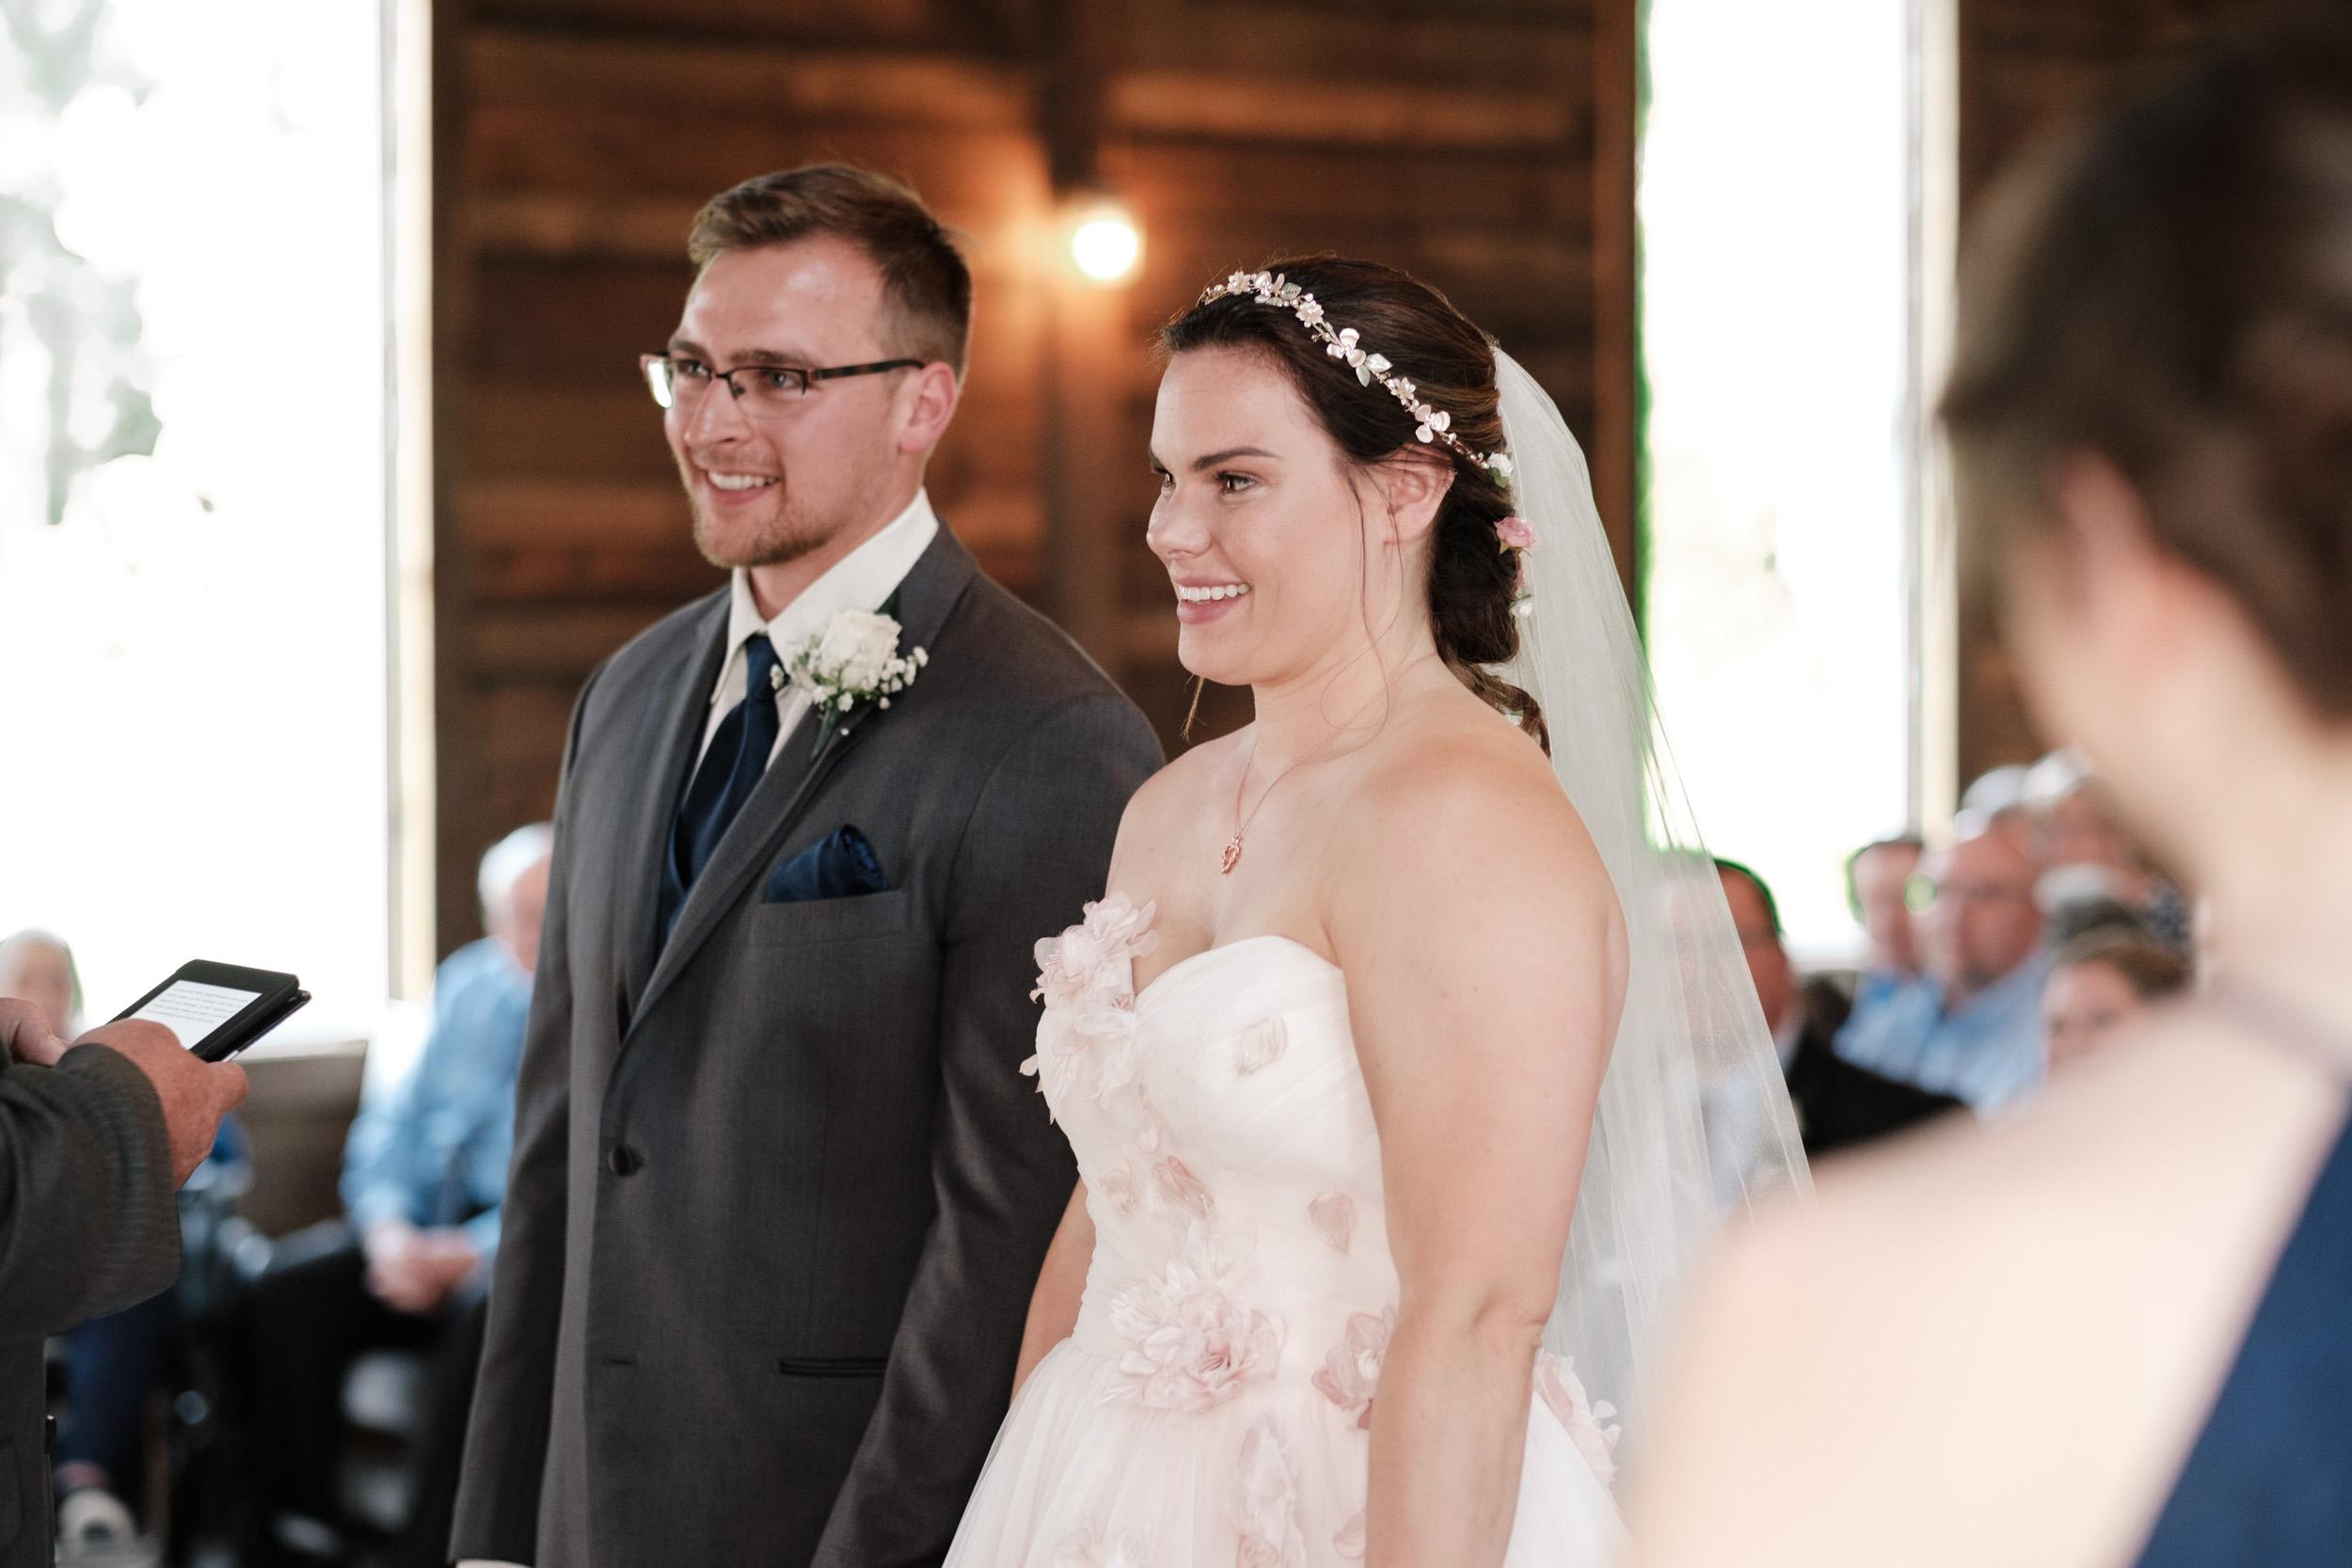 19-06-22-Ryan-Katie-The-Fields-Reserve-Wedding-26.jpg